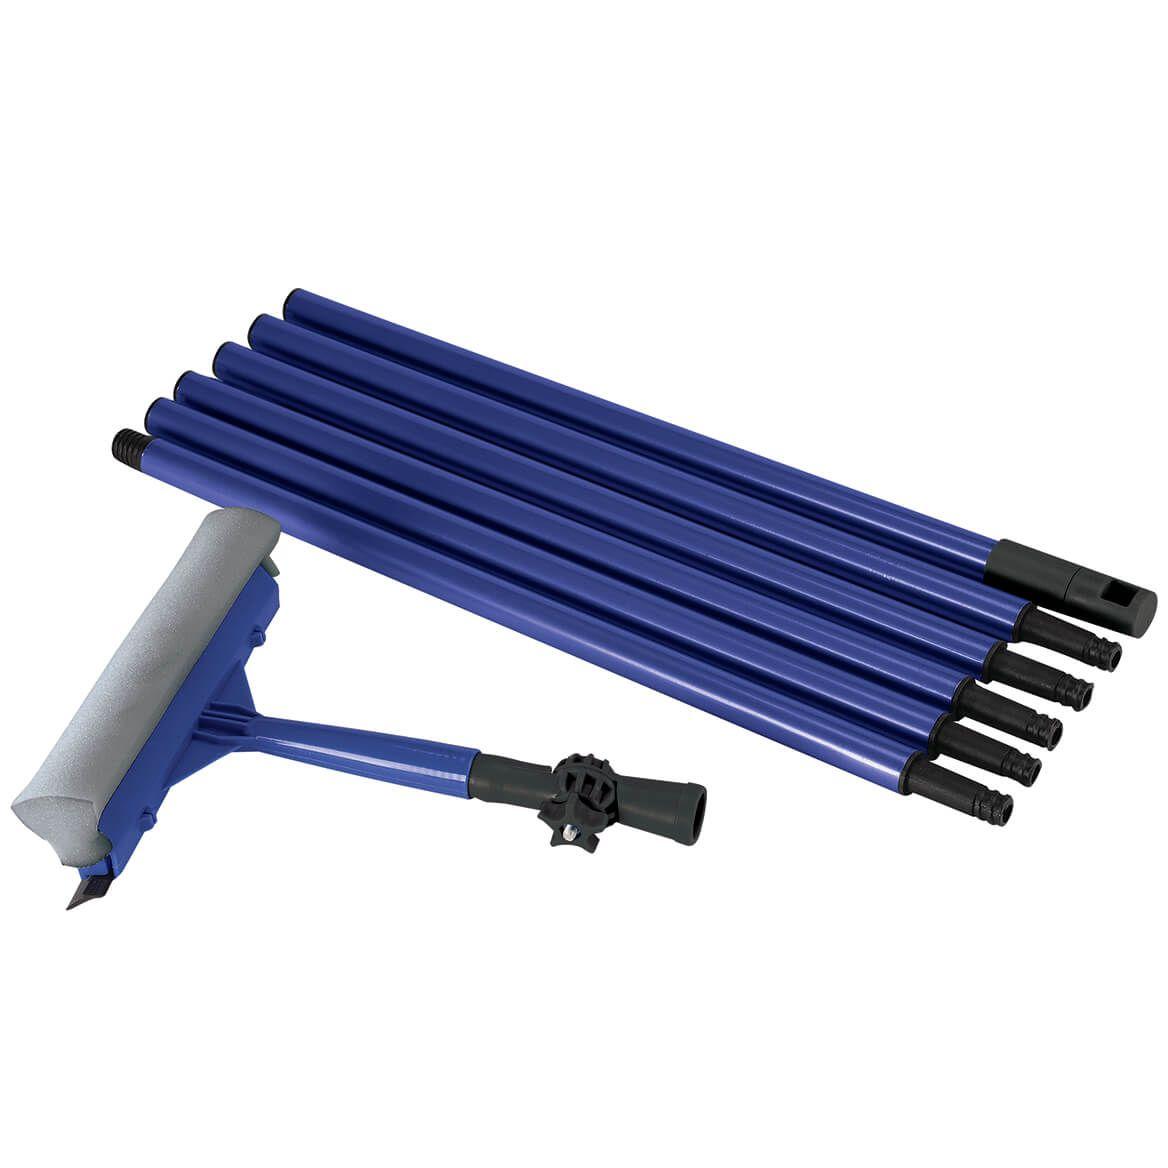 Long Handle Window Cleaner-371690